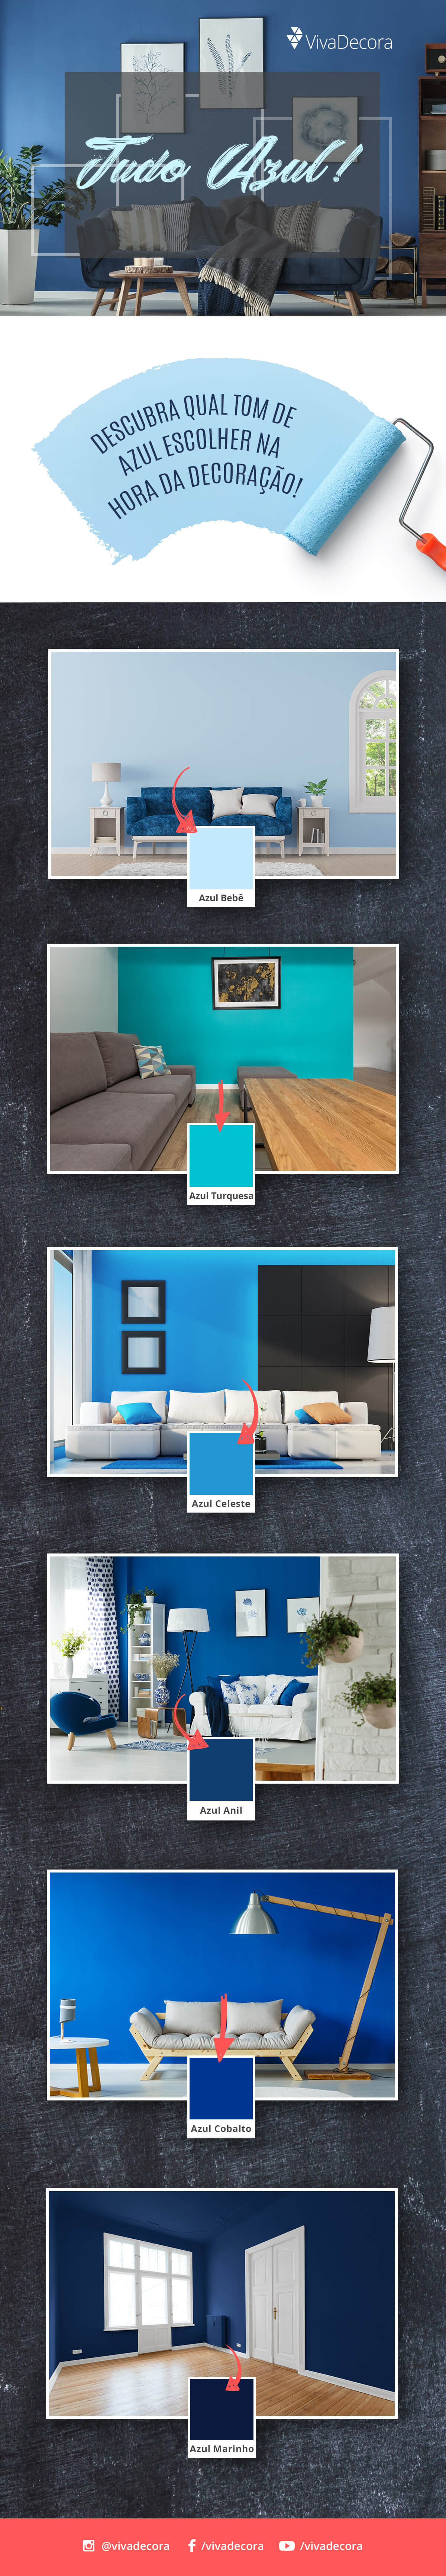 Infográfico - Tons de Azul